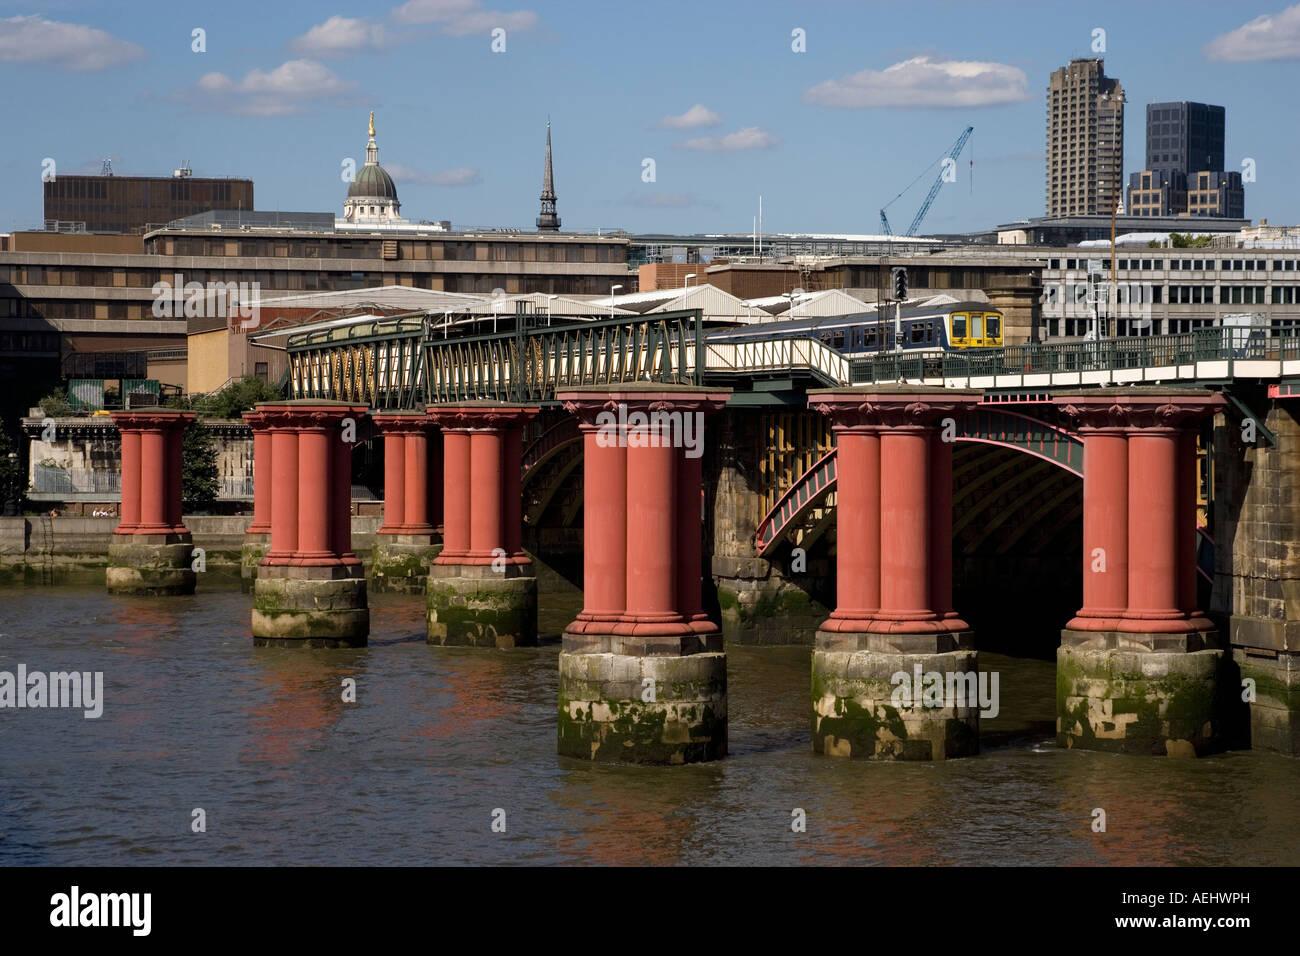 Dismantled Blackfriars Bridge London England - Stock Image